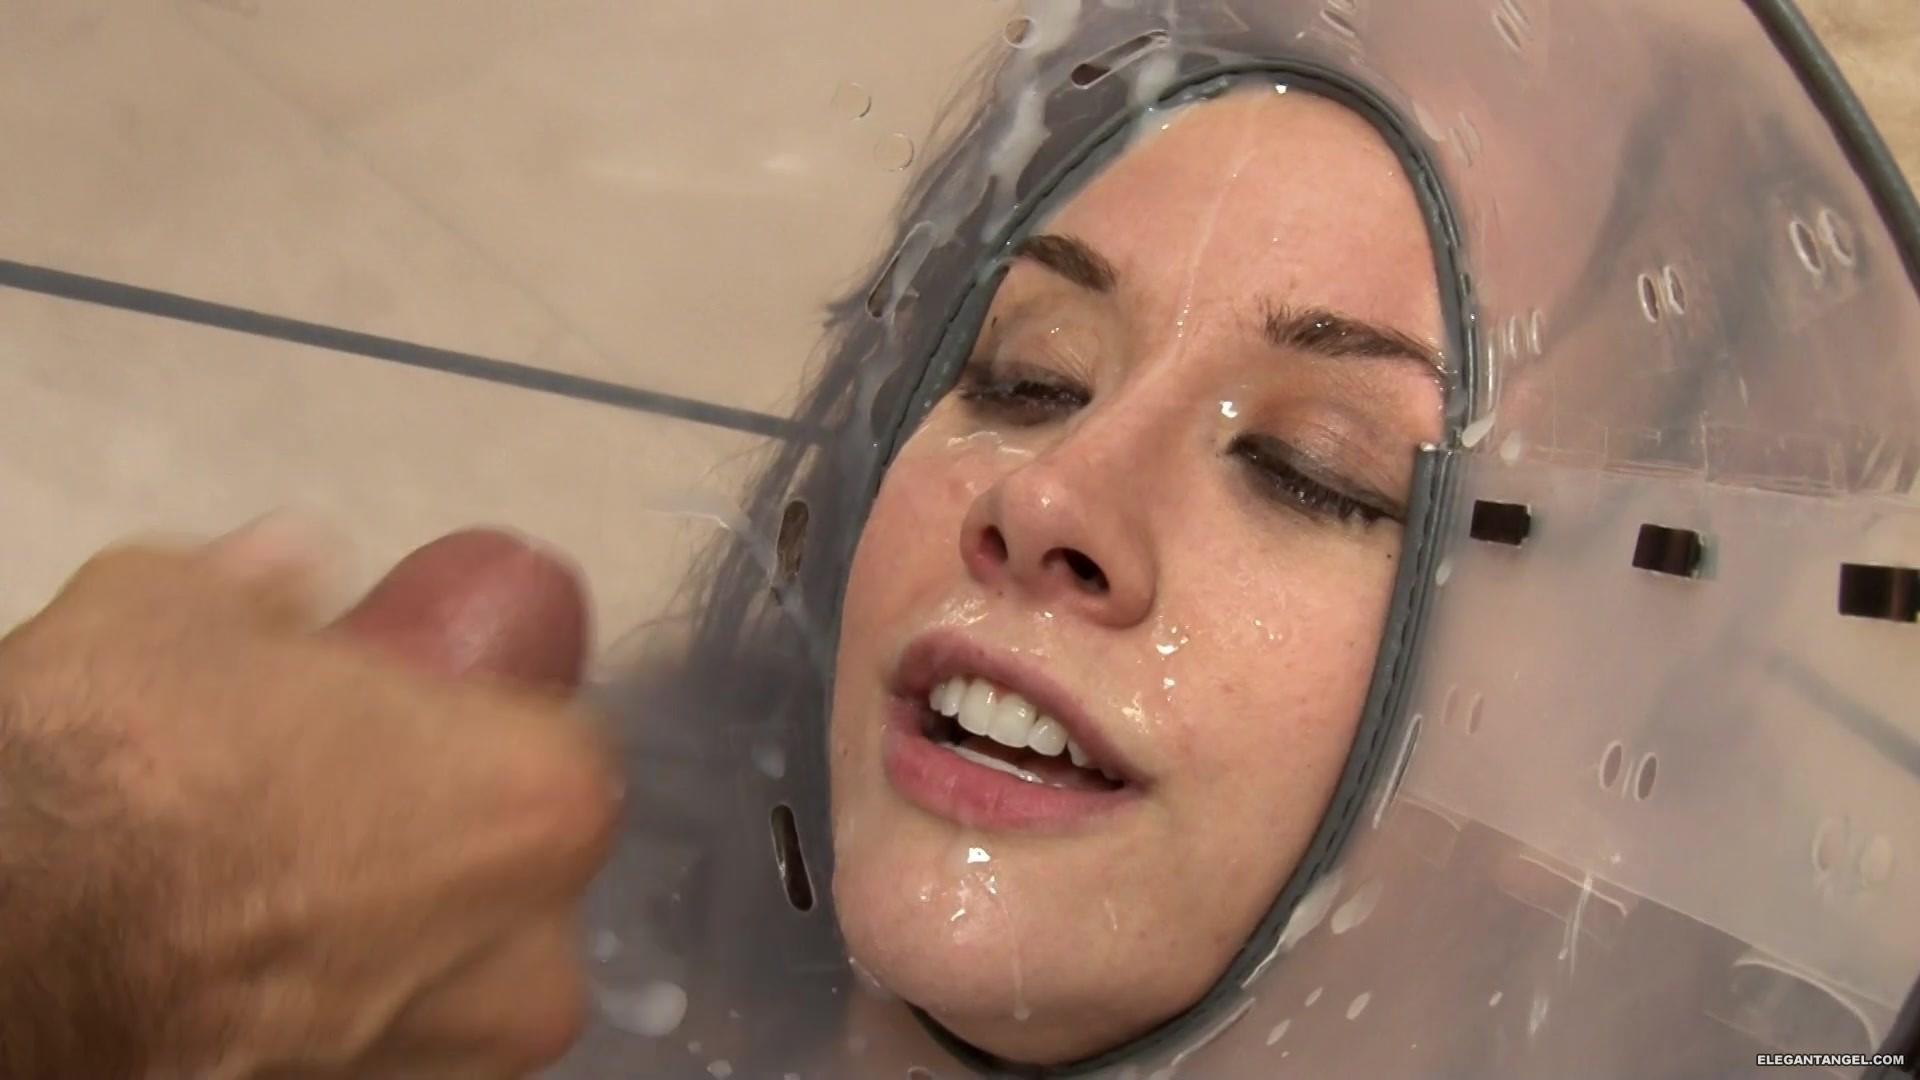 Vibrators in shower